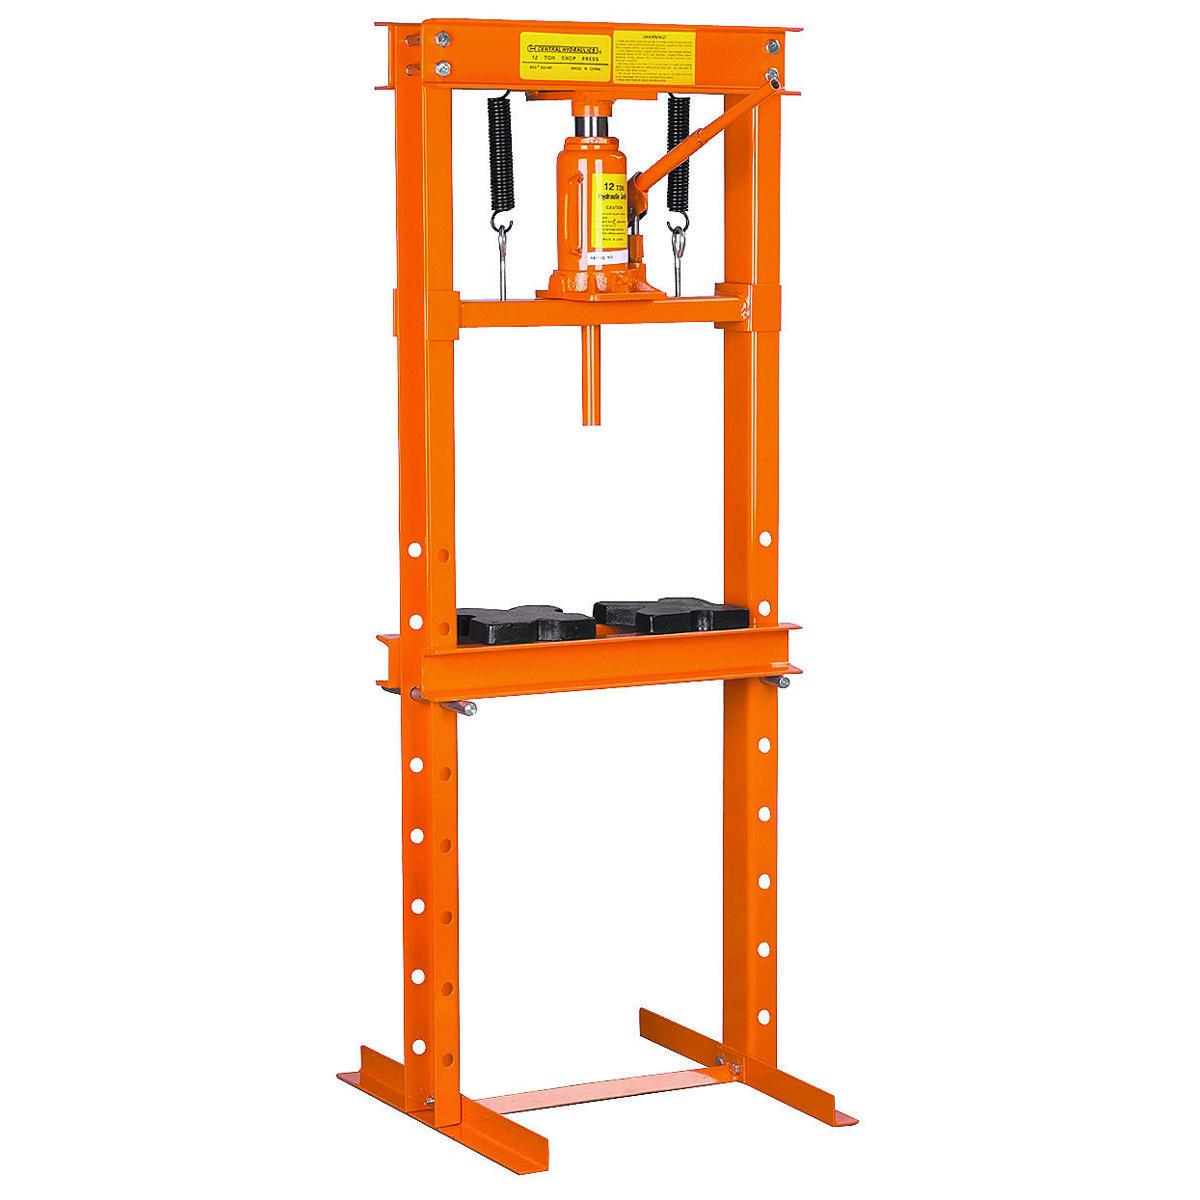 12 ton HFrame Industrial Heavy Duty Floor Shop Press